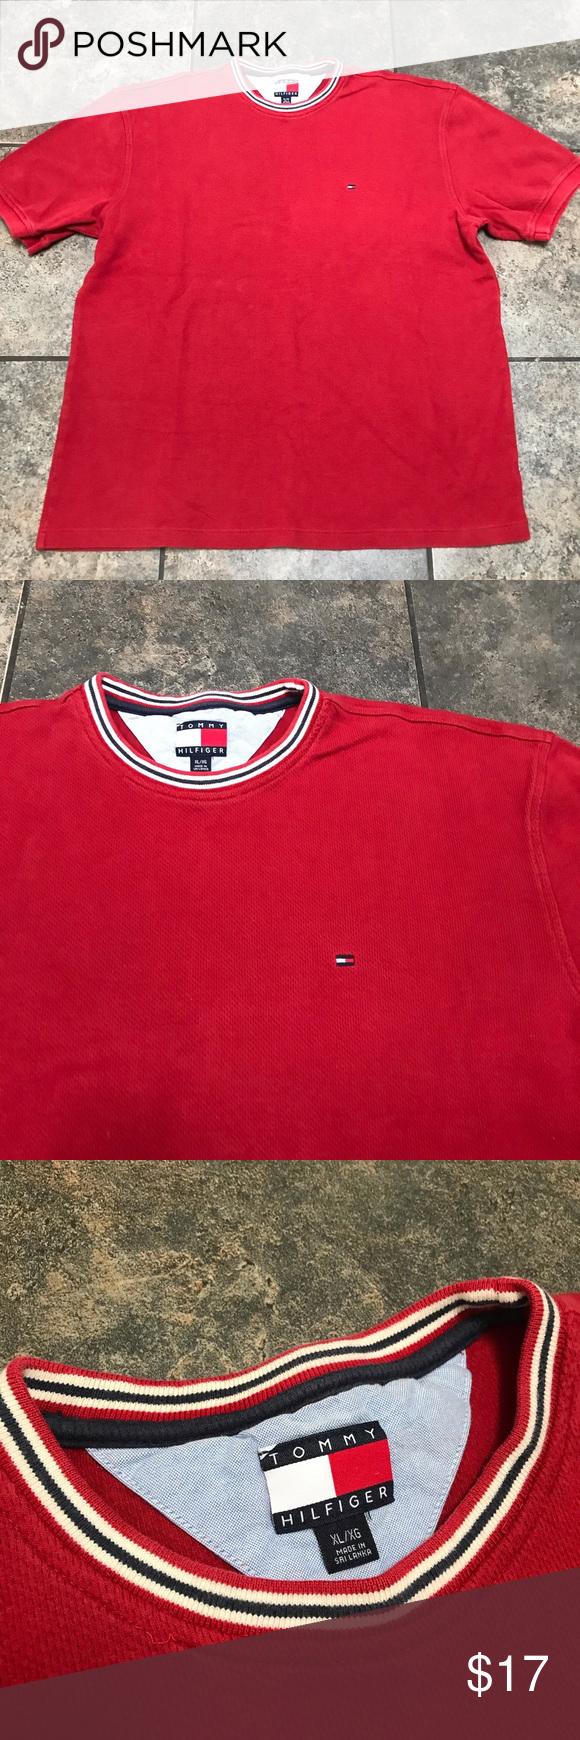 Tommy Hilfiger Men's Tee Shirt, Size XL